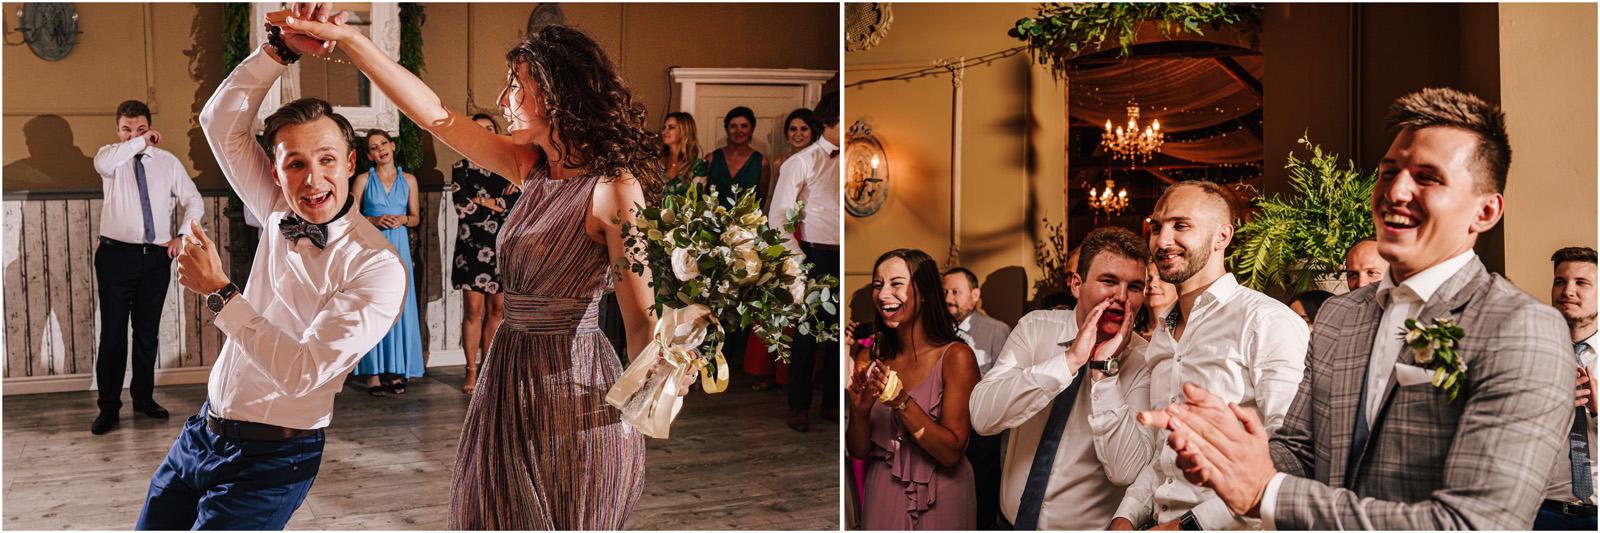 Ania & Mateusz | boho wesele w Stodole pod Kasztanami 146